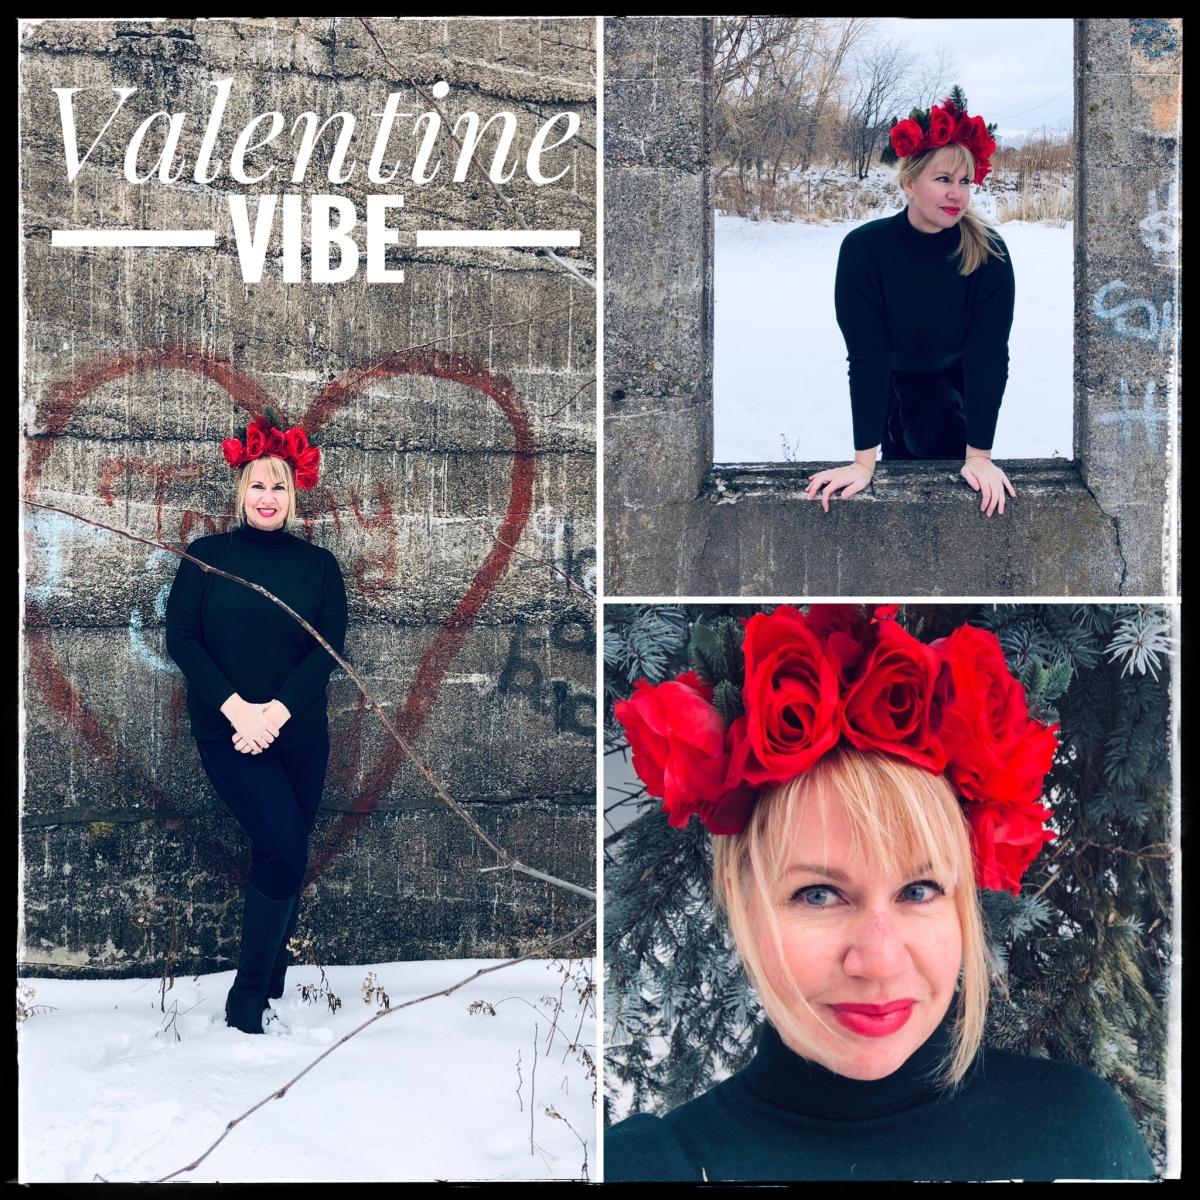 Valentine Vibe